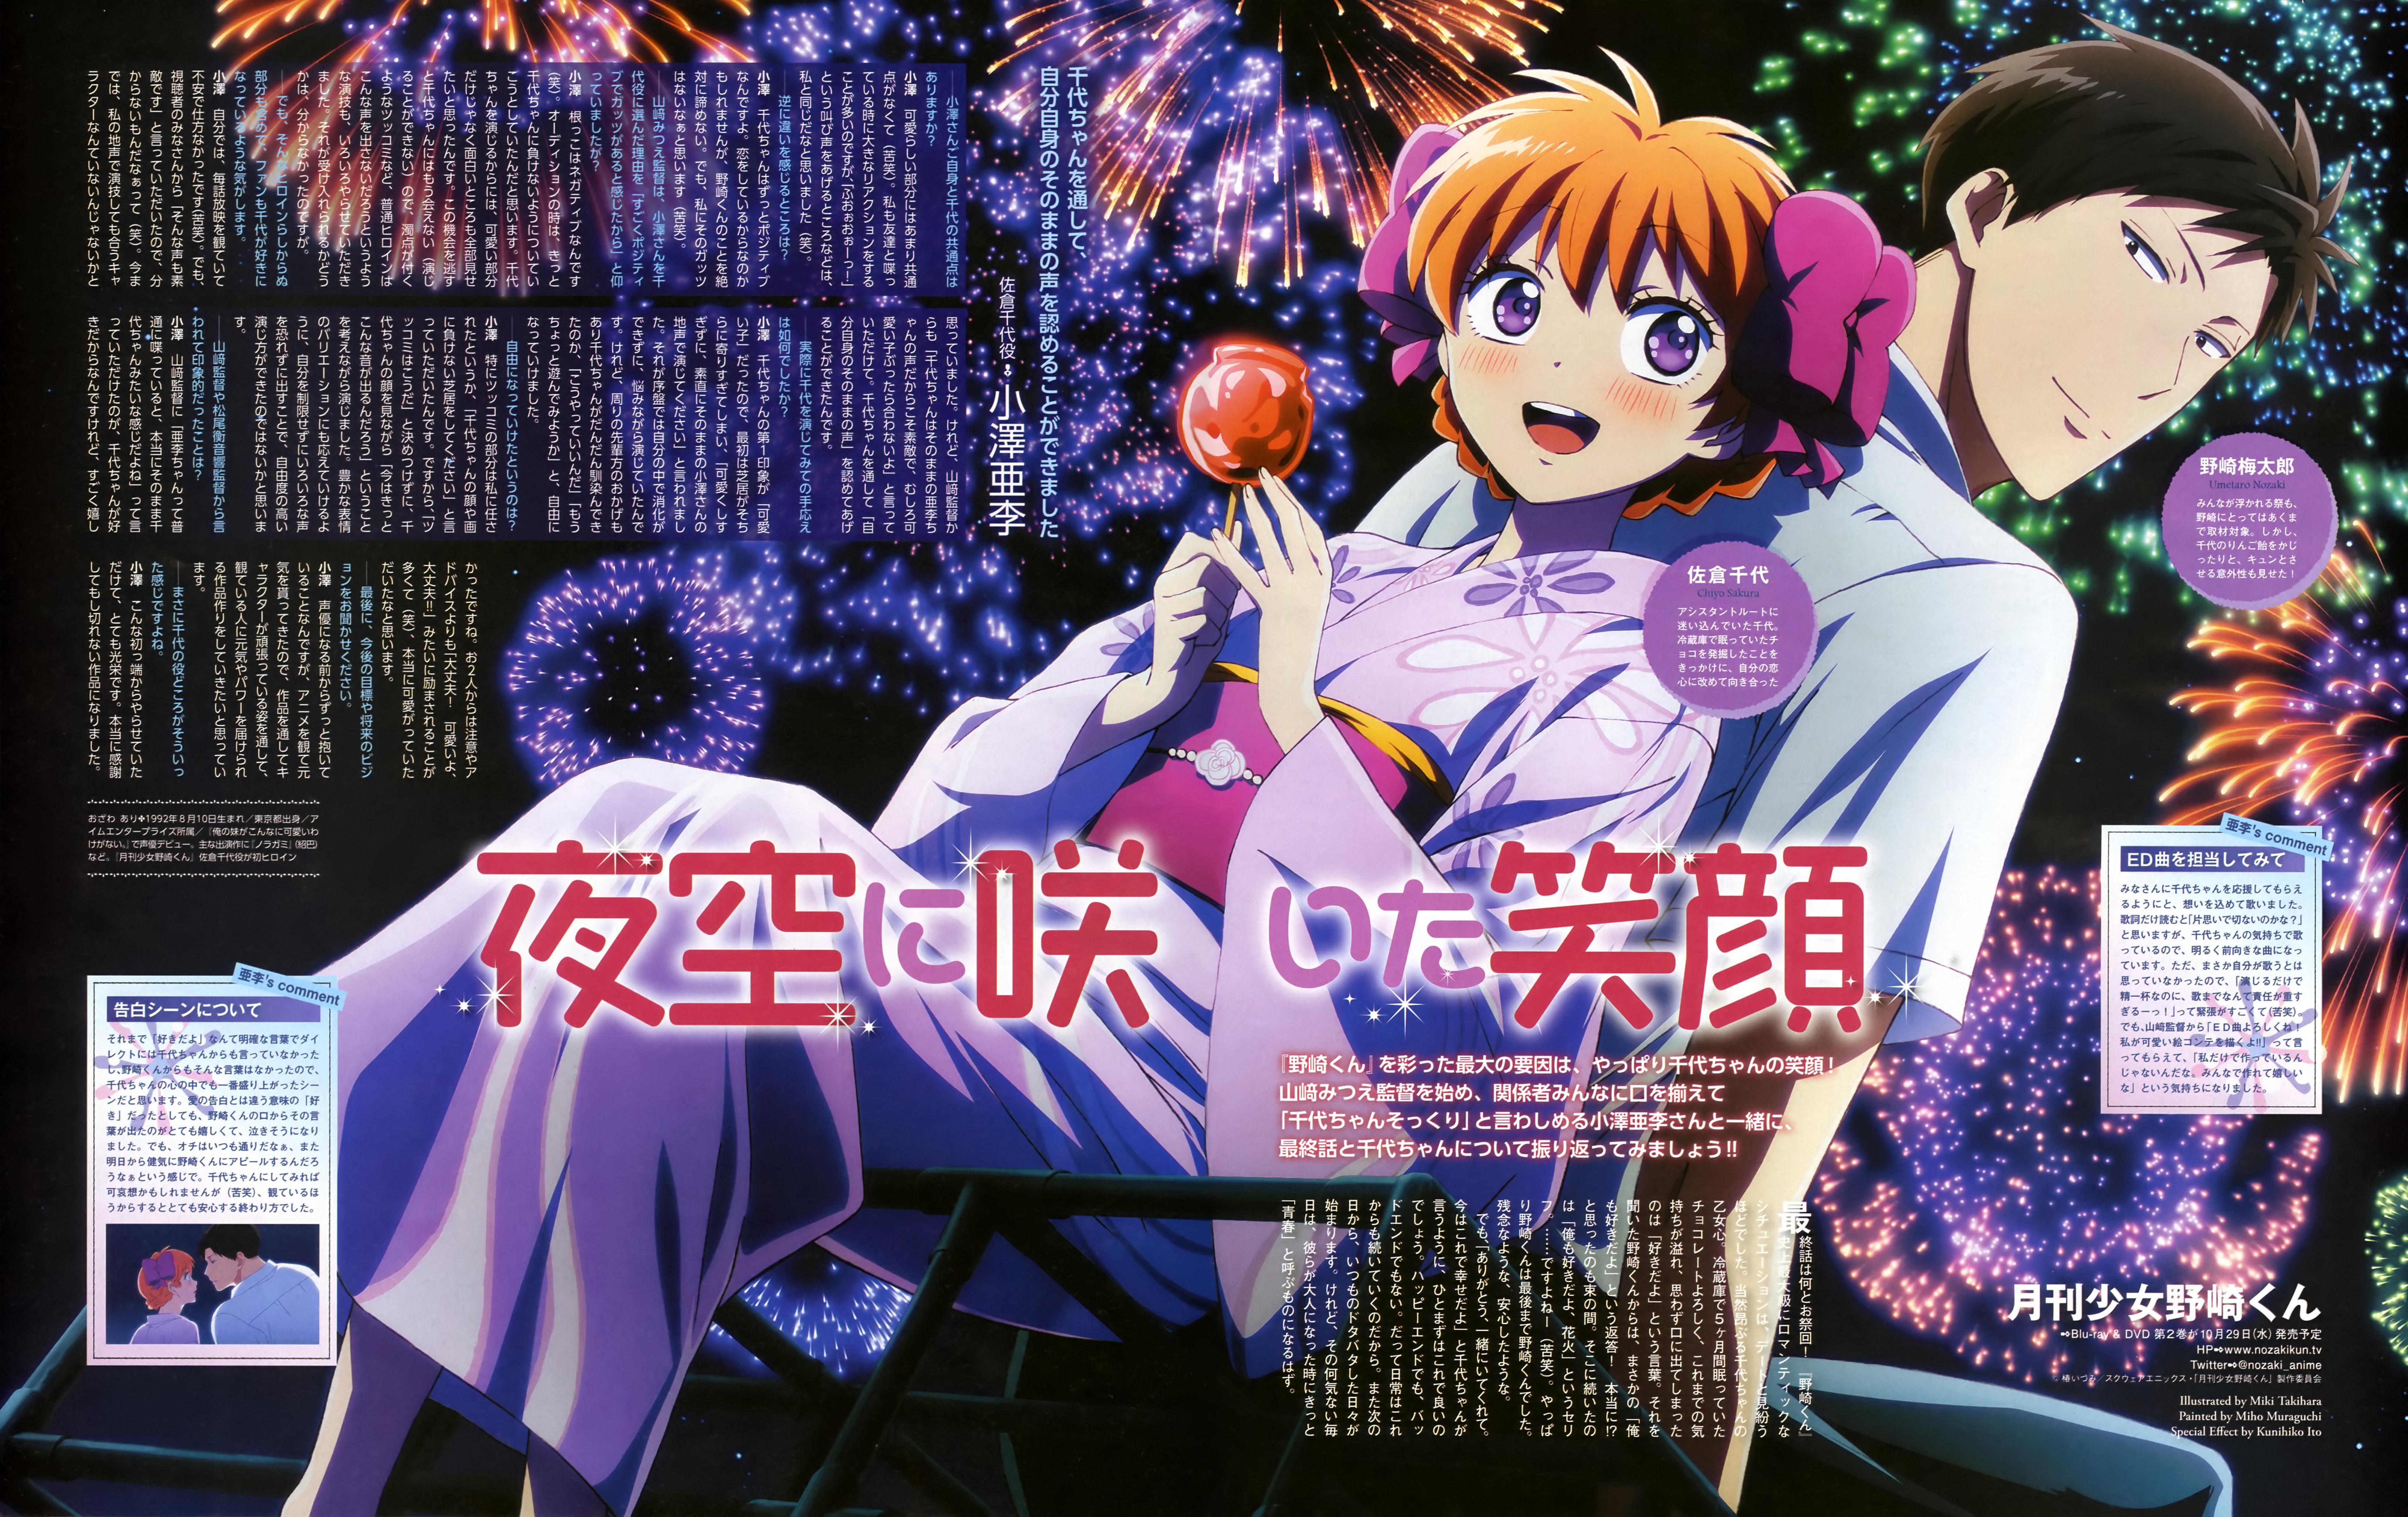 Gekkan Shoujo Nozaki-kun (Monthly Girls' Nozaki-kun) Image #1785646